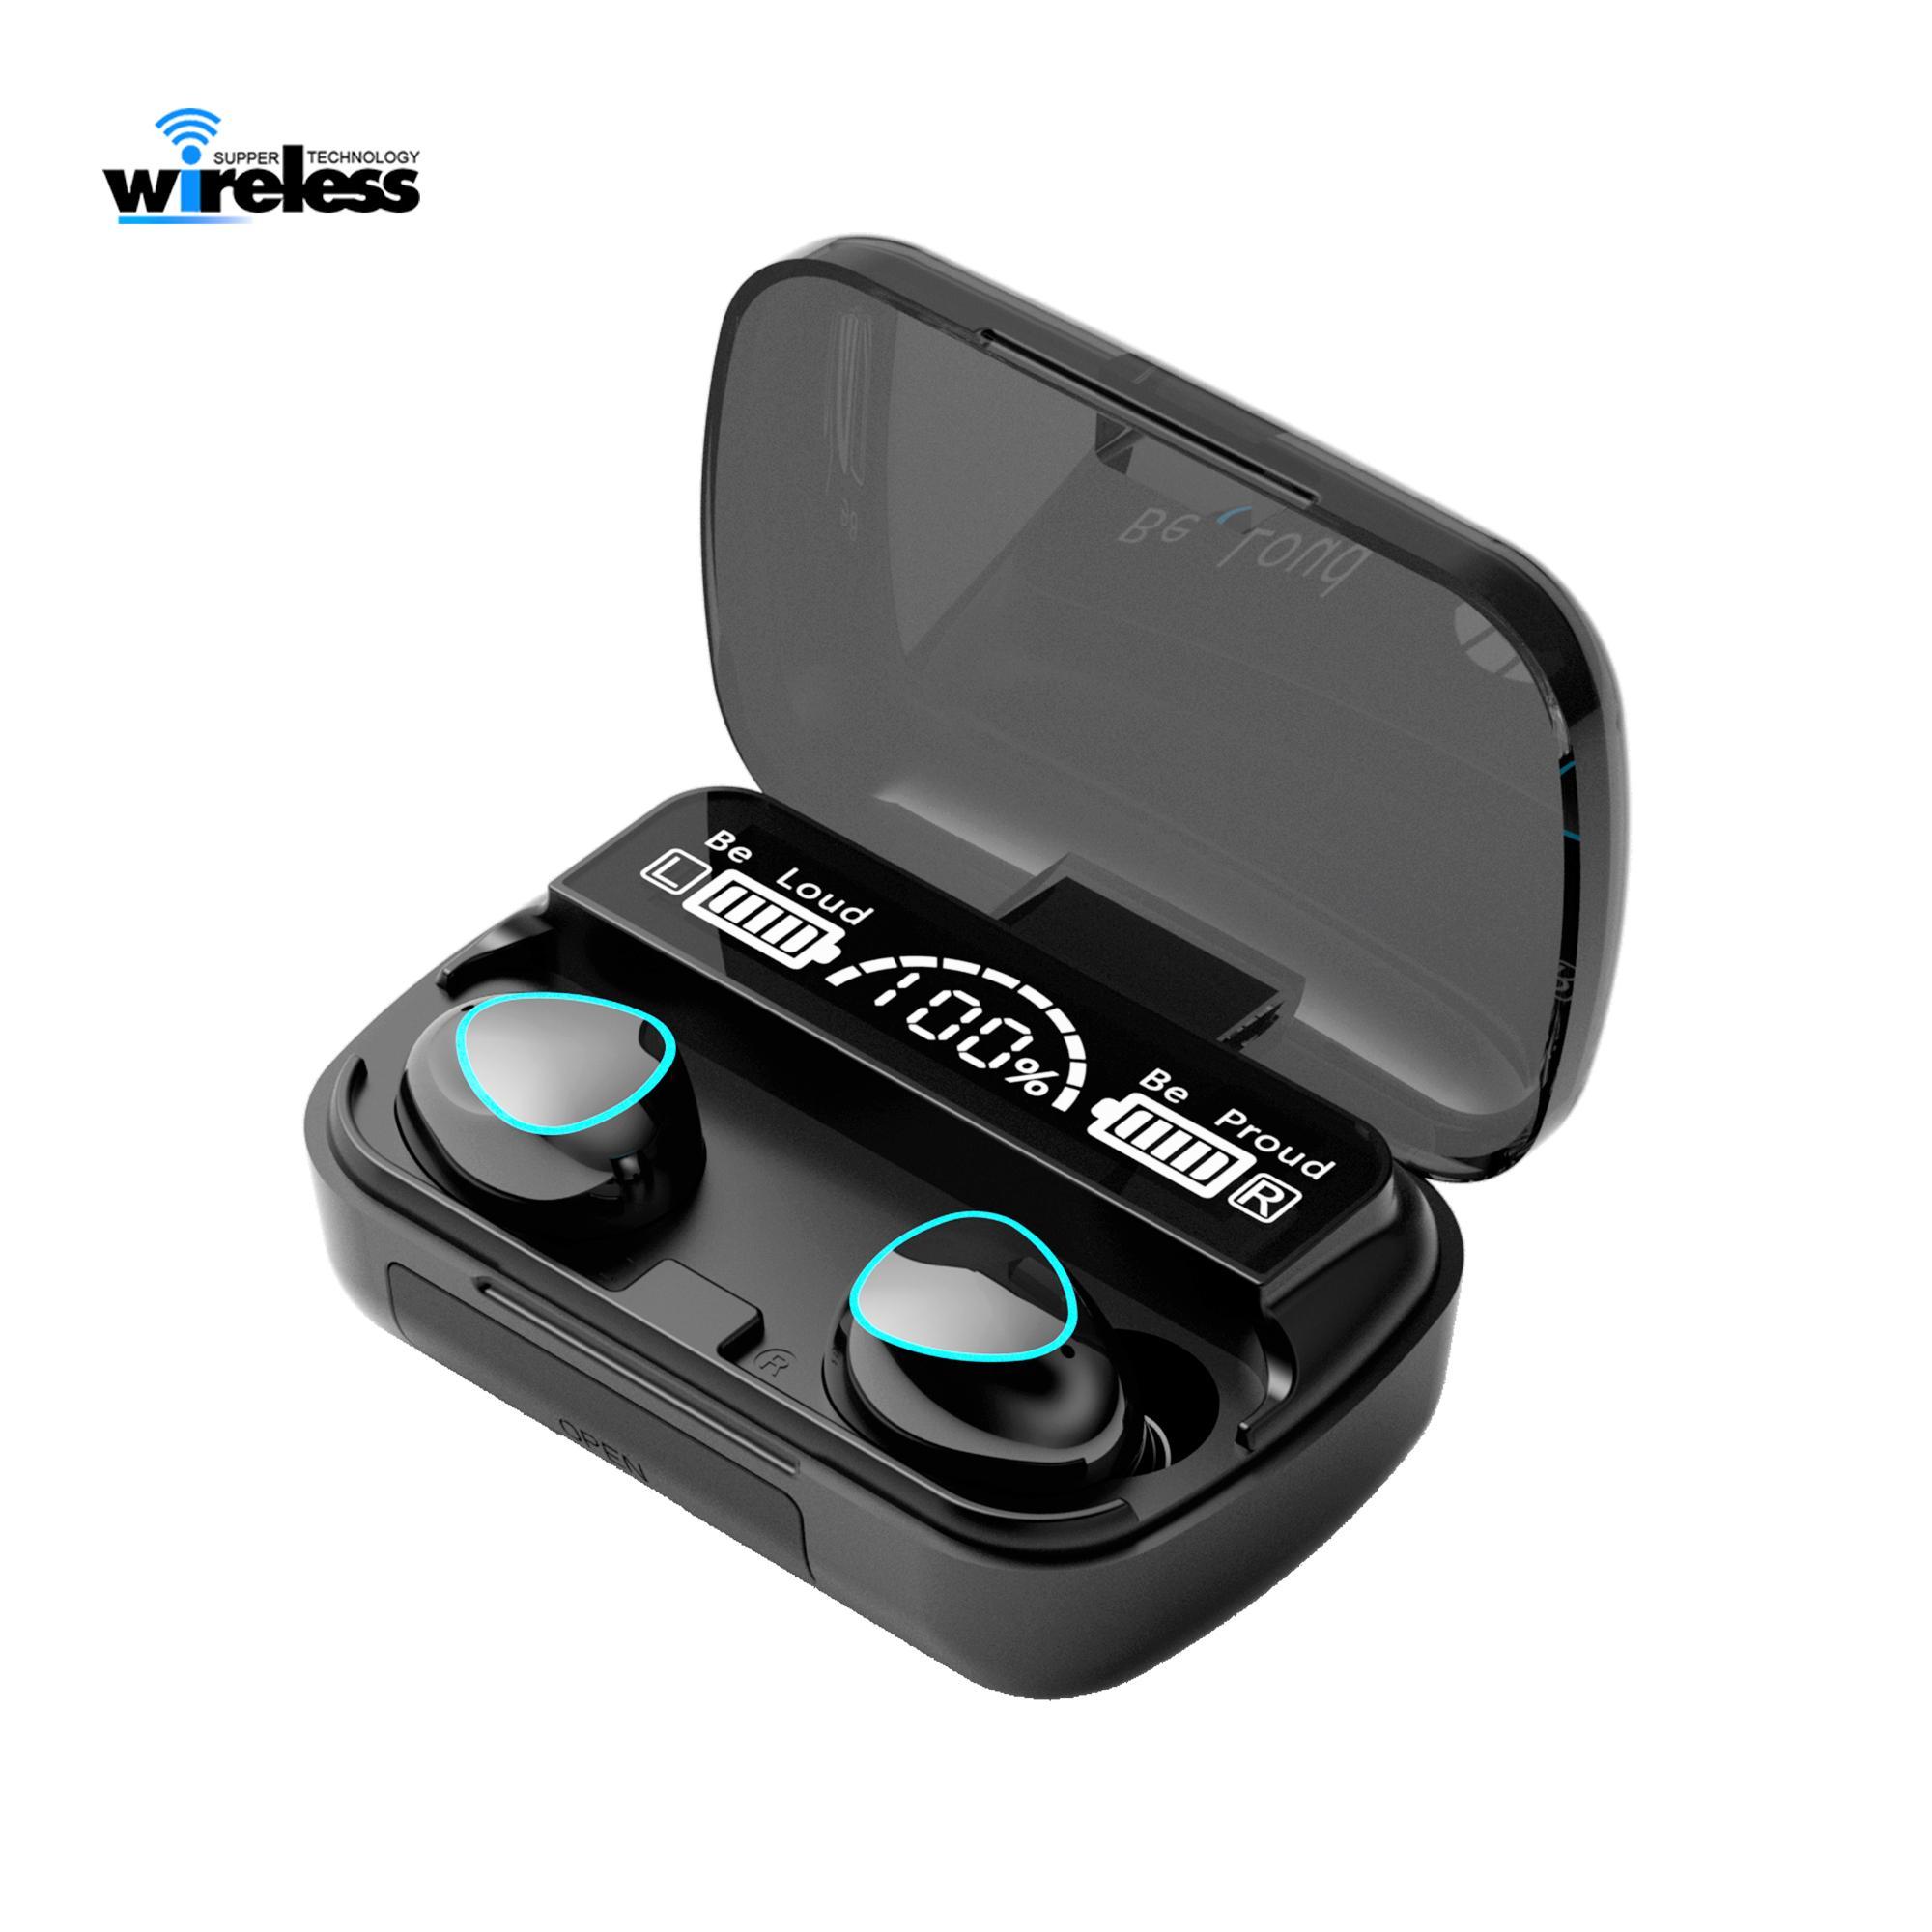 M10 Tws Bluetooth-Kopfhörer drahtlose Kopfhörer Stereo-Sport-Kopfhörer berühren wasserdichte Gaming-Headset F9-Ohrhörer 2000mAh LED-Anzeige